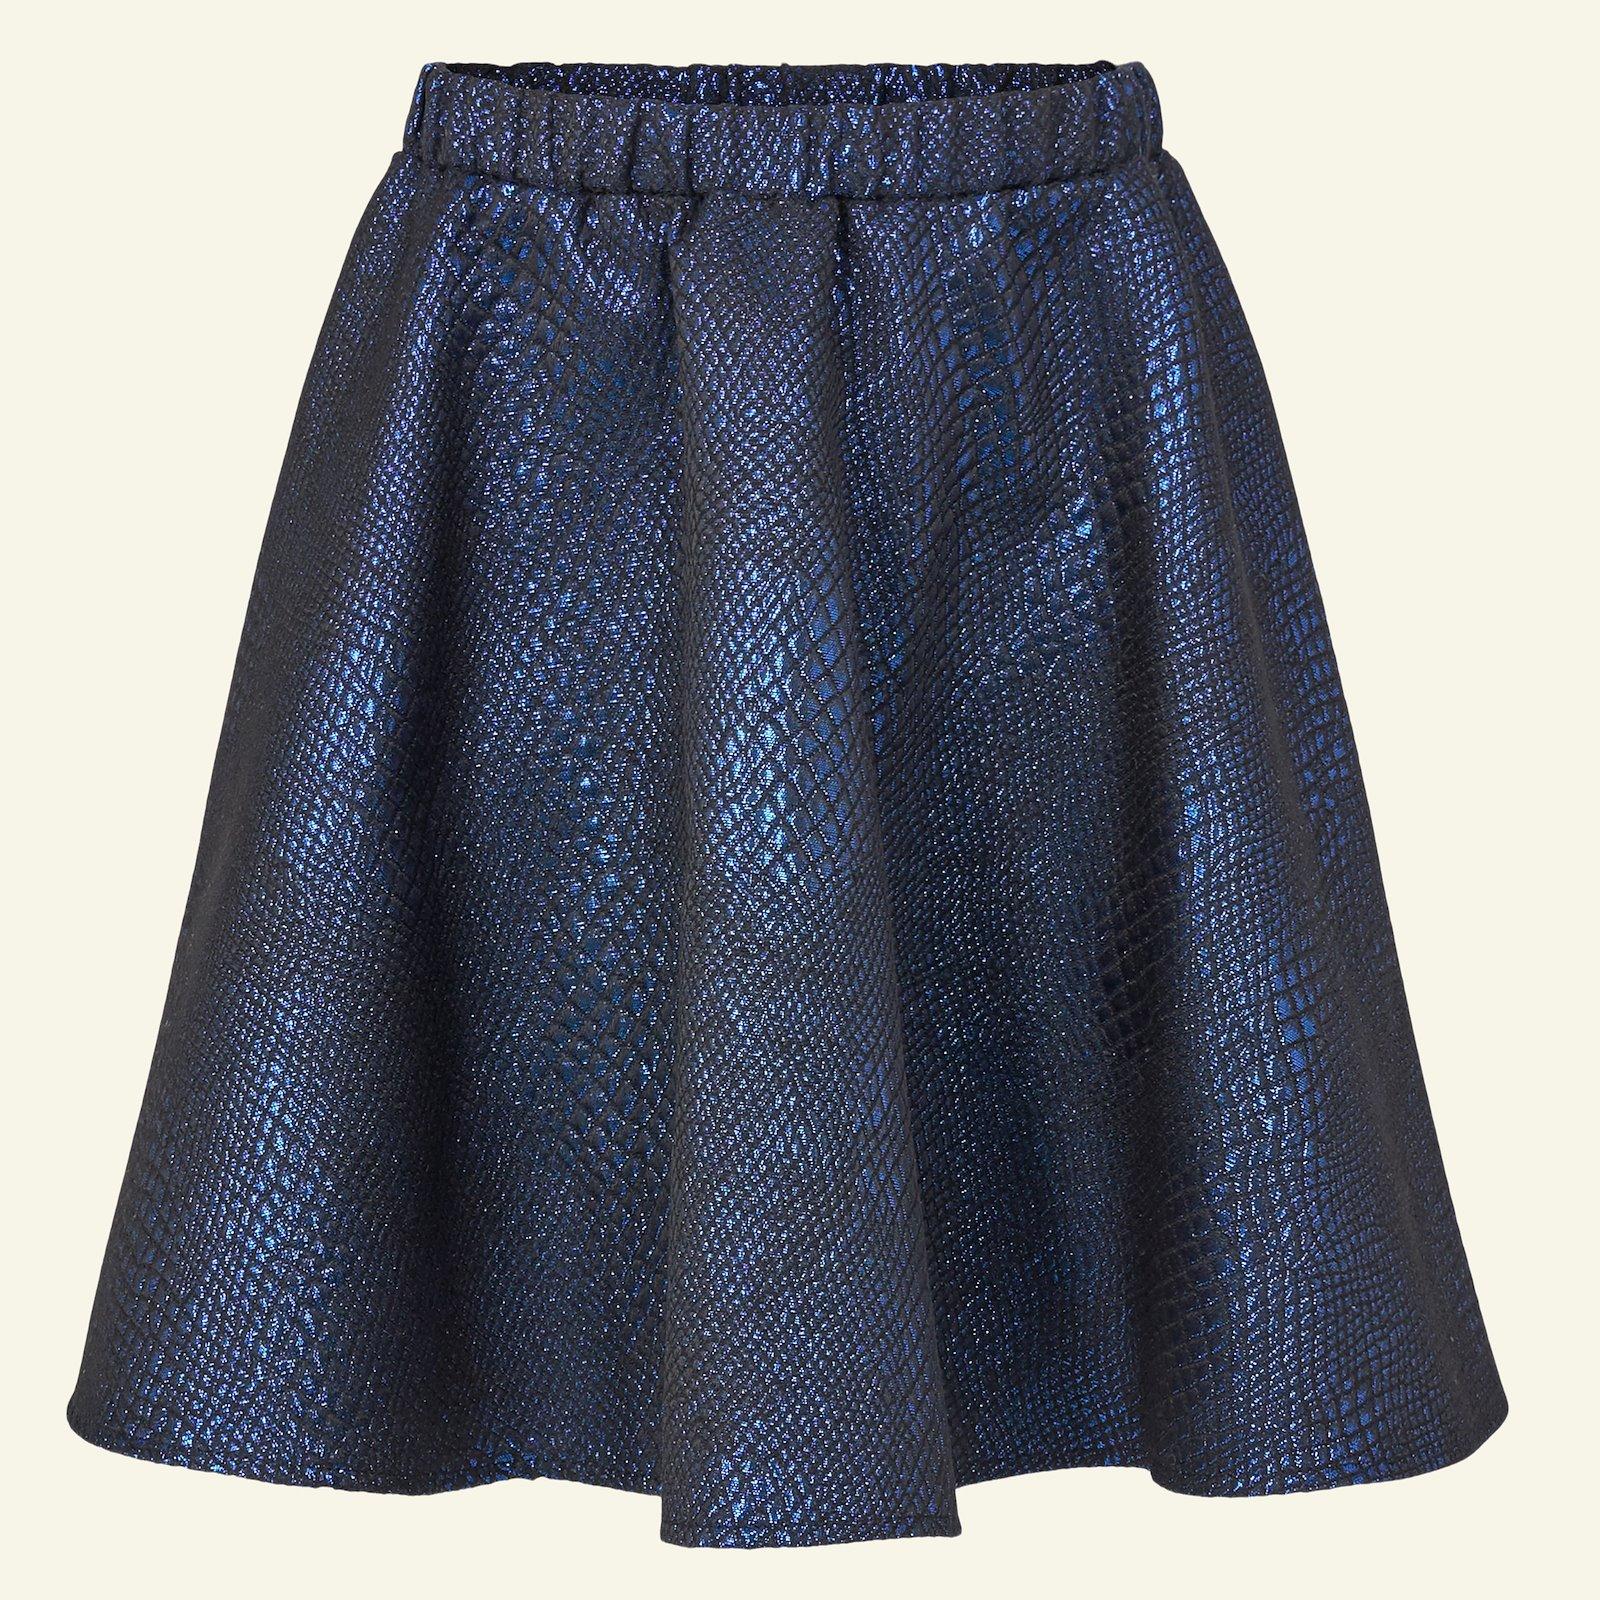 Skirt circular, 104/4y p61019_400307_sskit